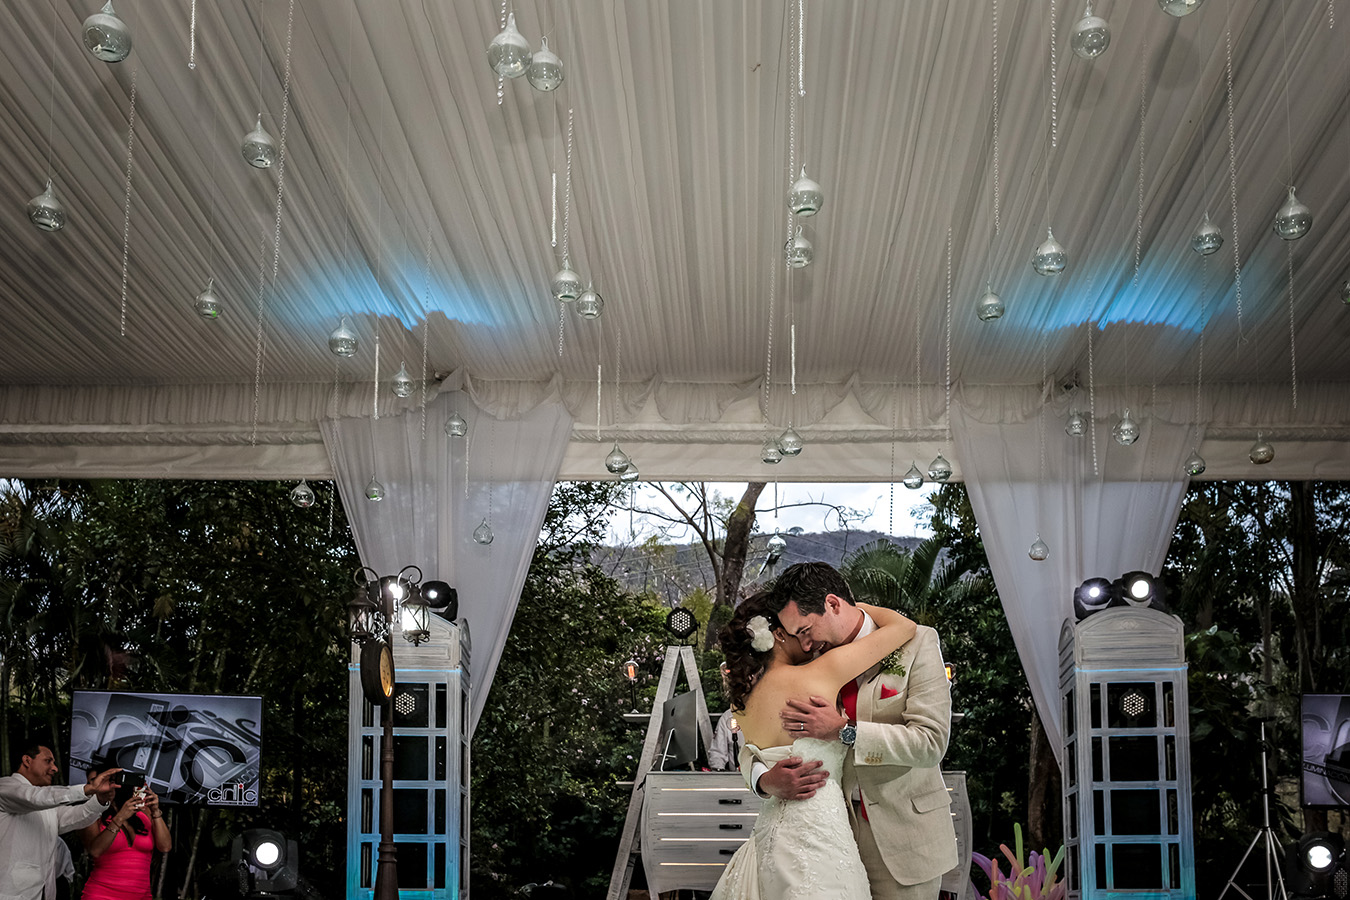 Matatenafotografia Wedding Photographer | Hacienda San Gaspar LJP 6